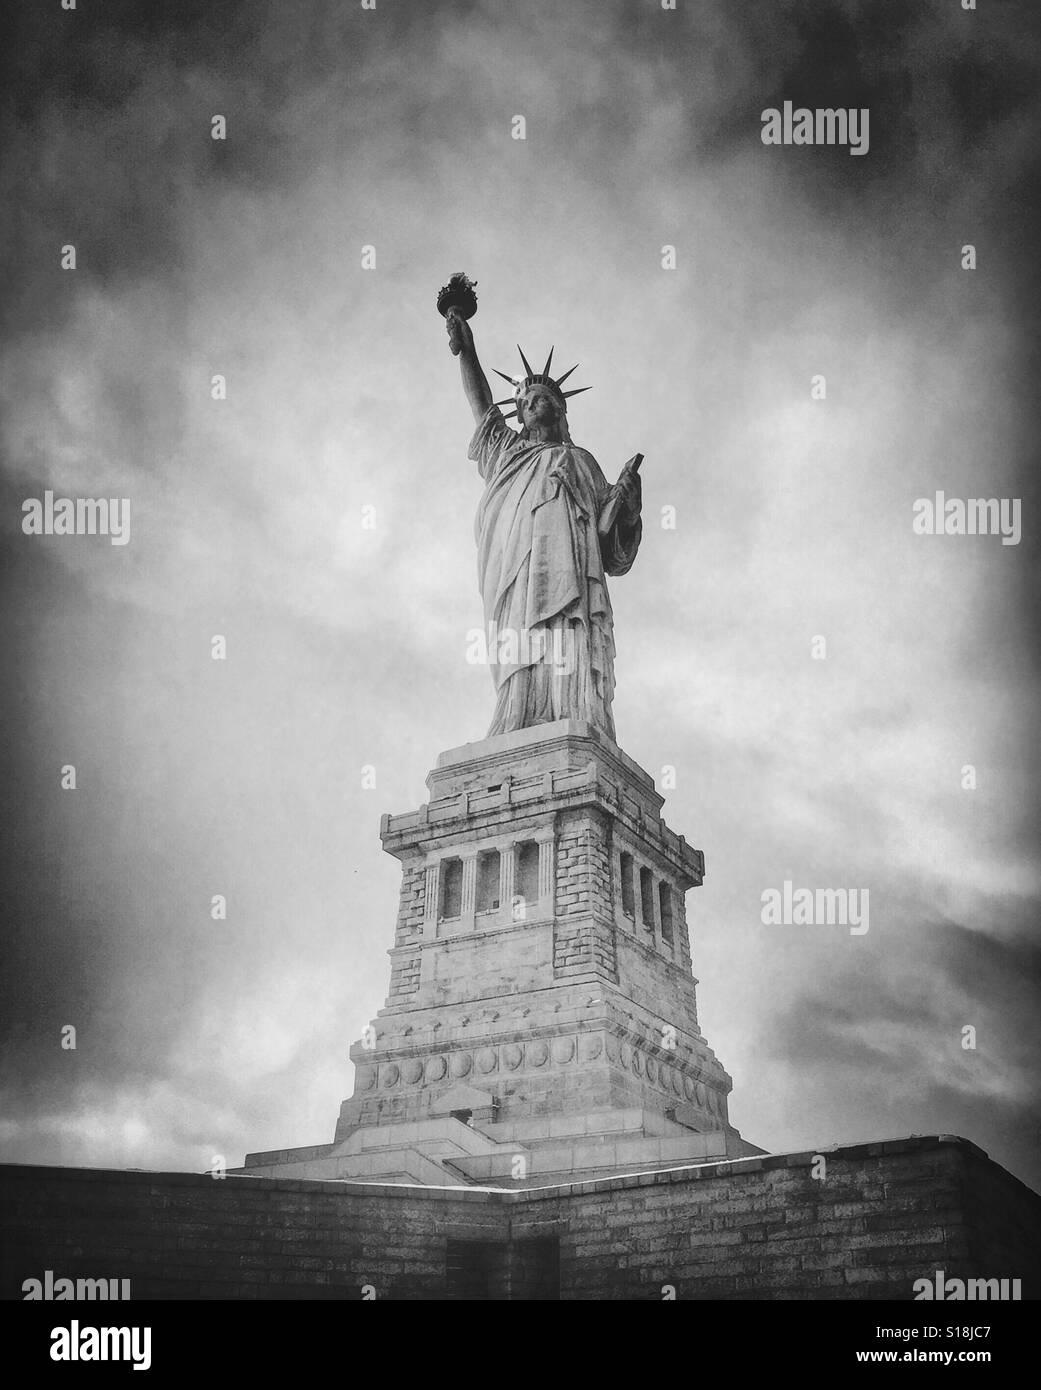 Statue de la Liberté - New York - incroyable Fine art Photography Photo Stock